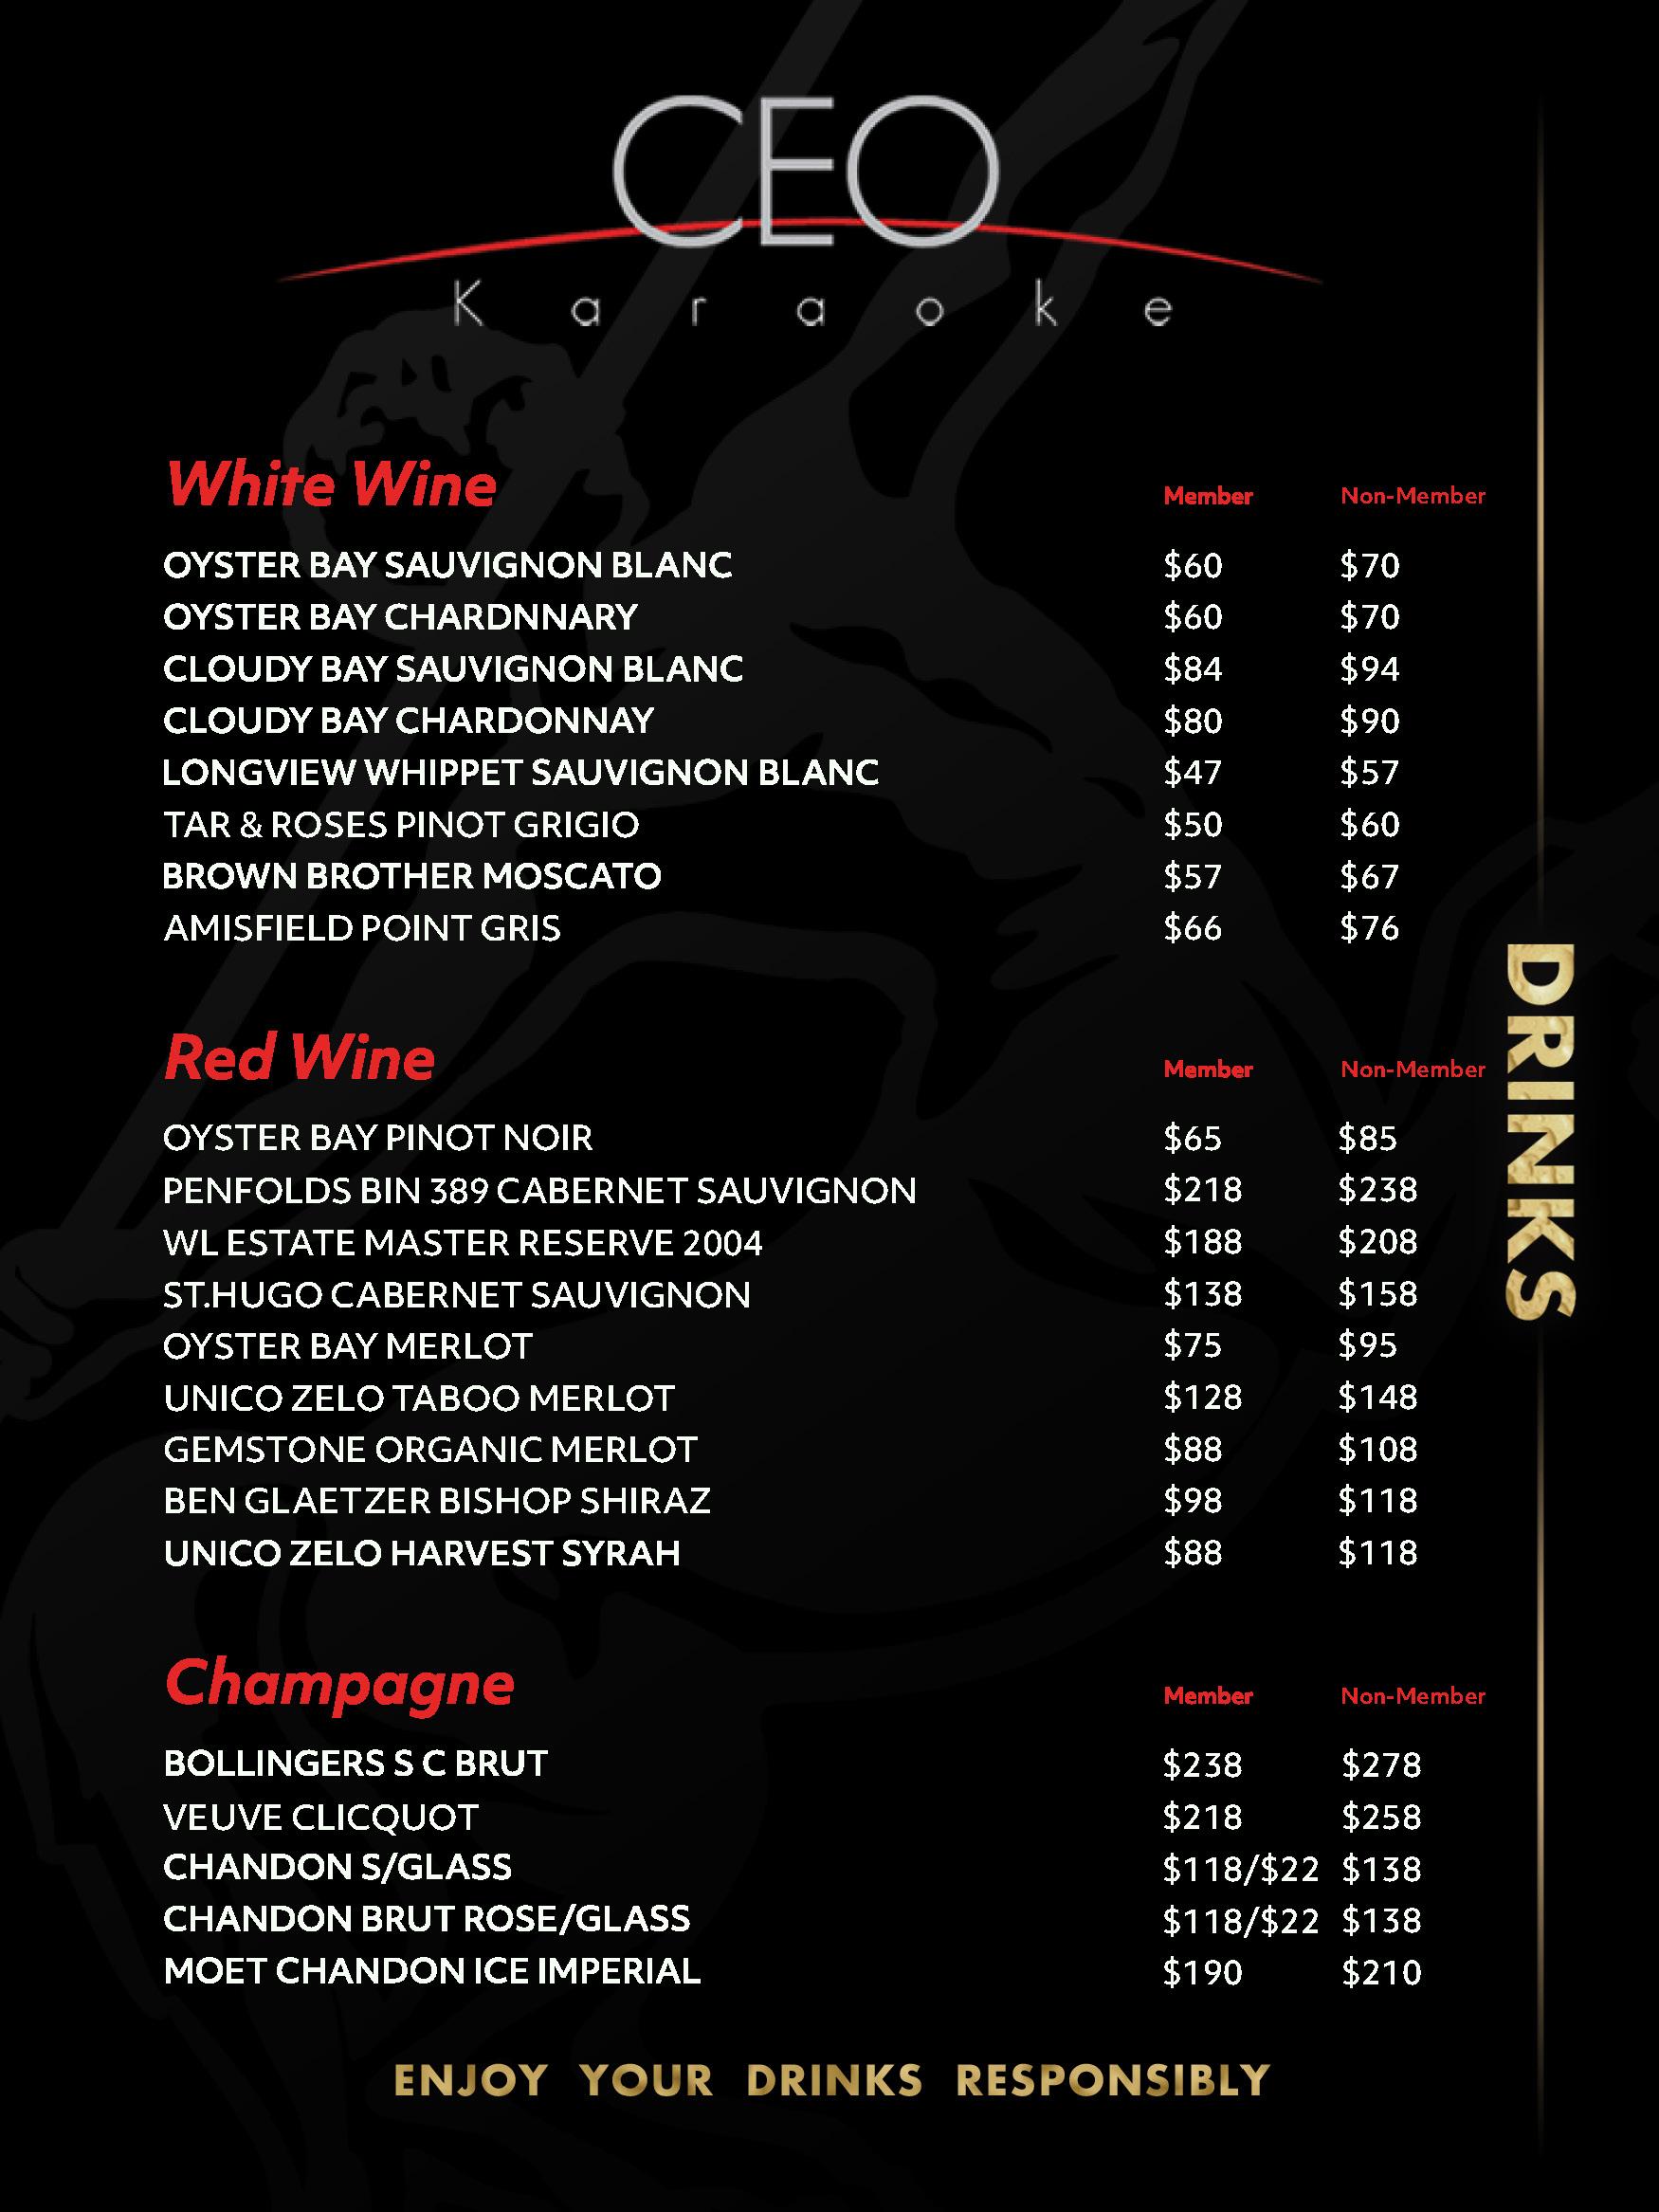 ceo-drinks-menu-fin_6